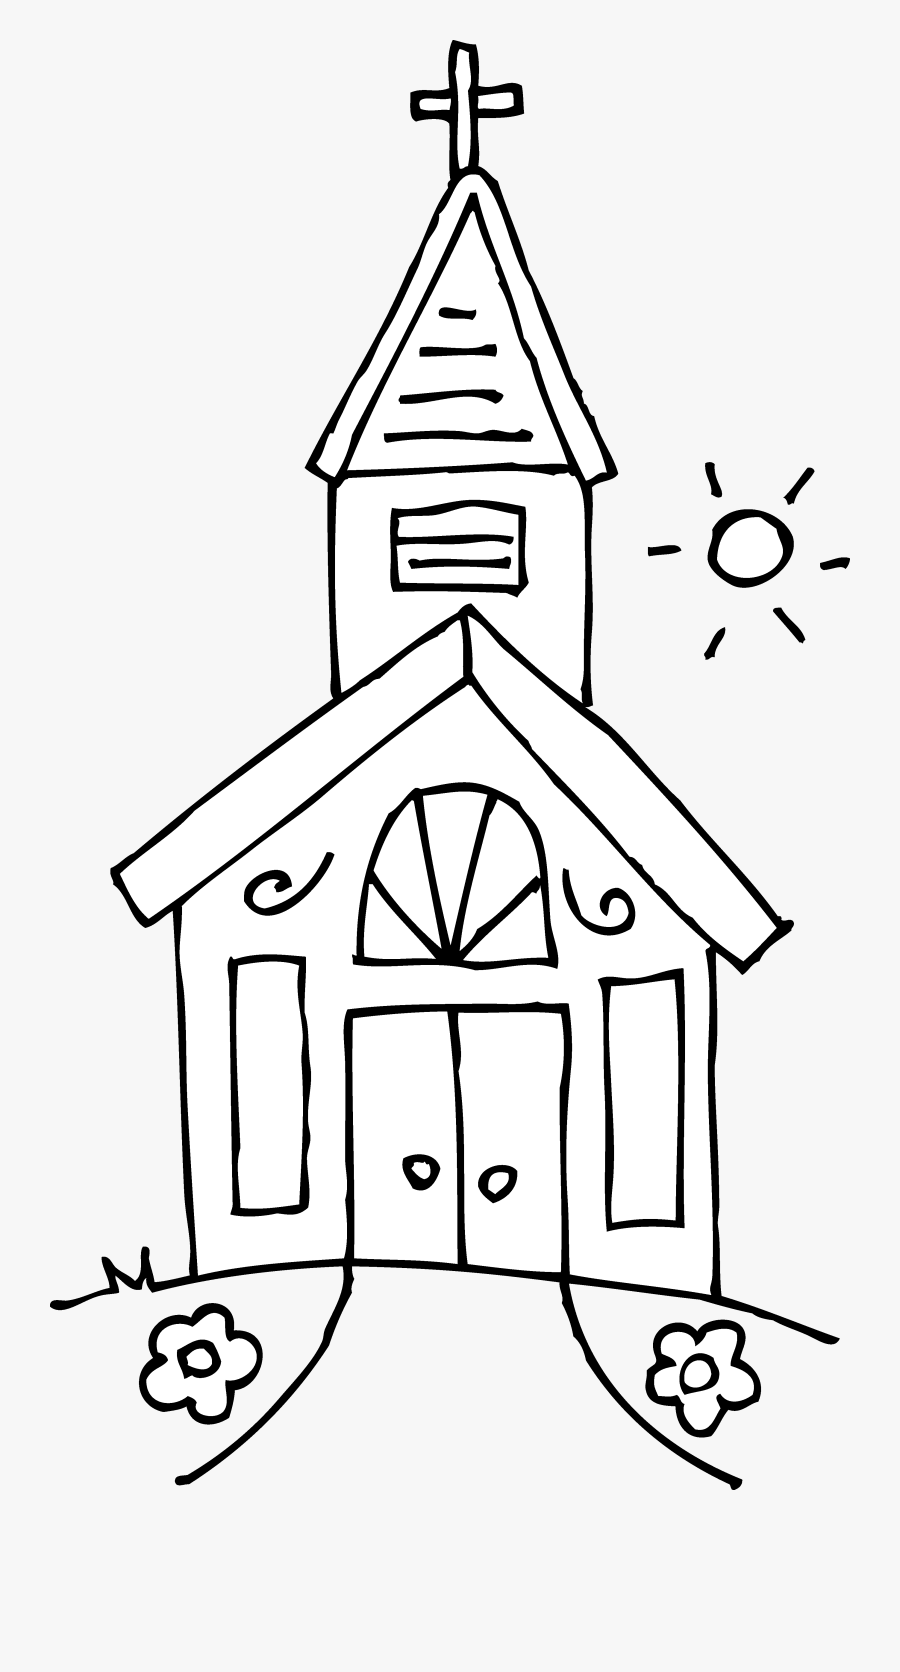 Church Clipart On Clip Art Free And Church 2 Clipartbold - Church Clipart Black And White, Transparent Clipart